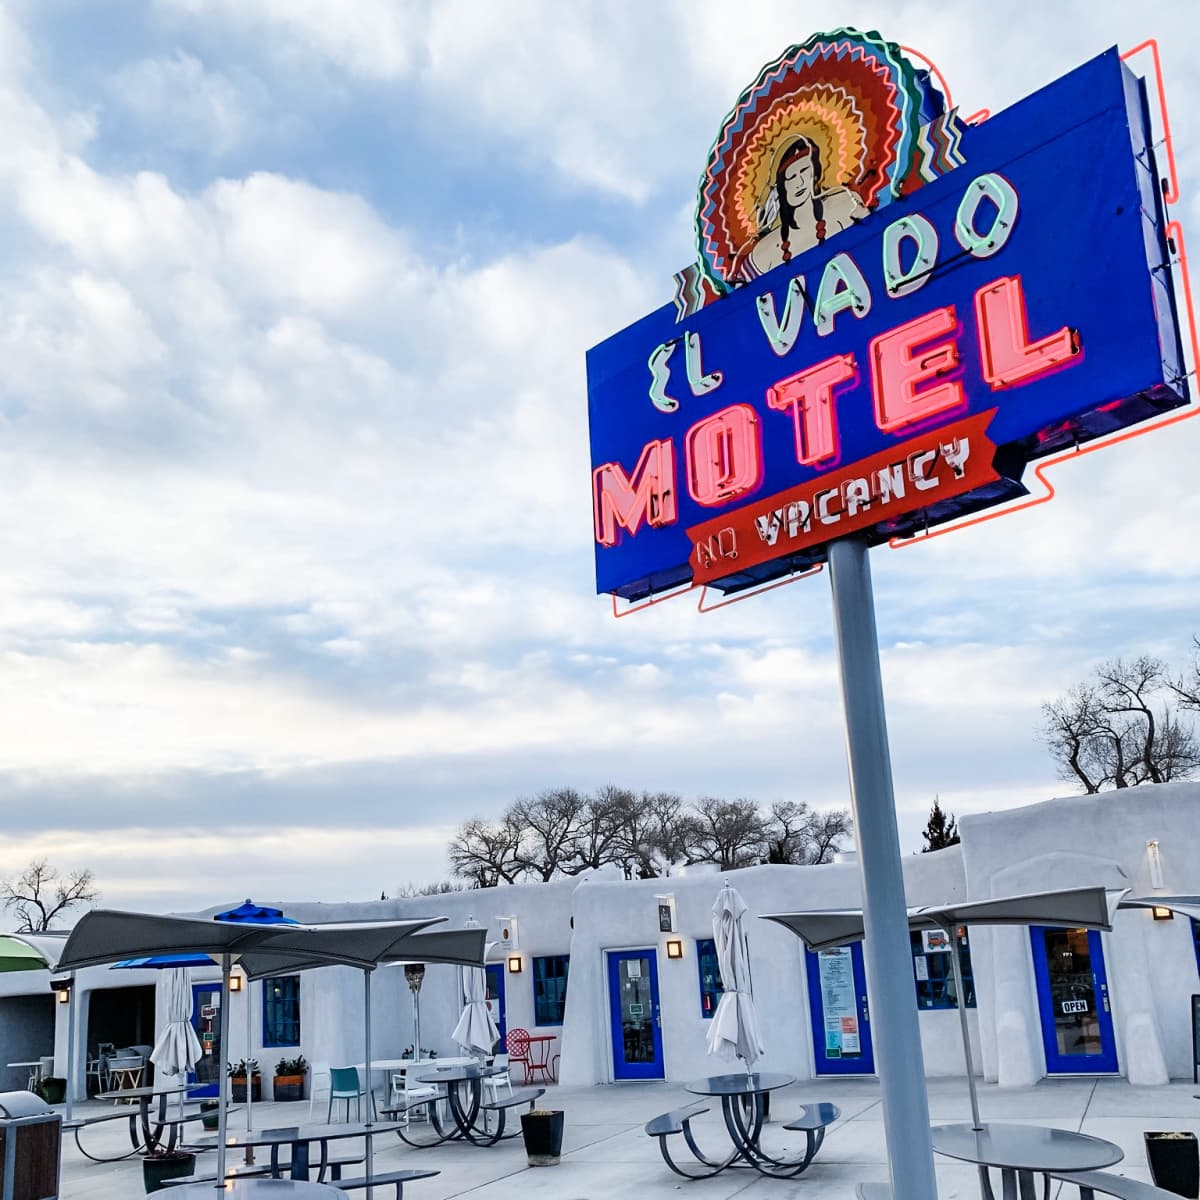 Dig the retro vibes at El Vado Motel in Albuquerque with children